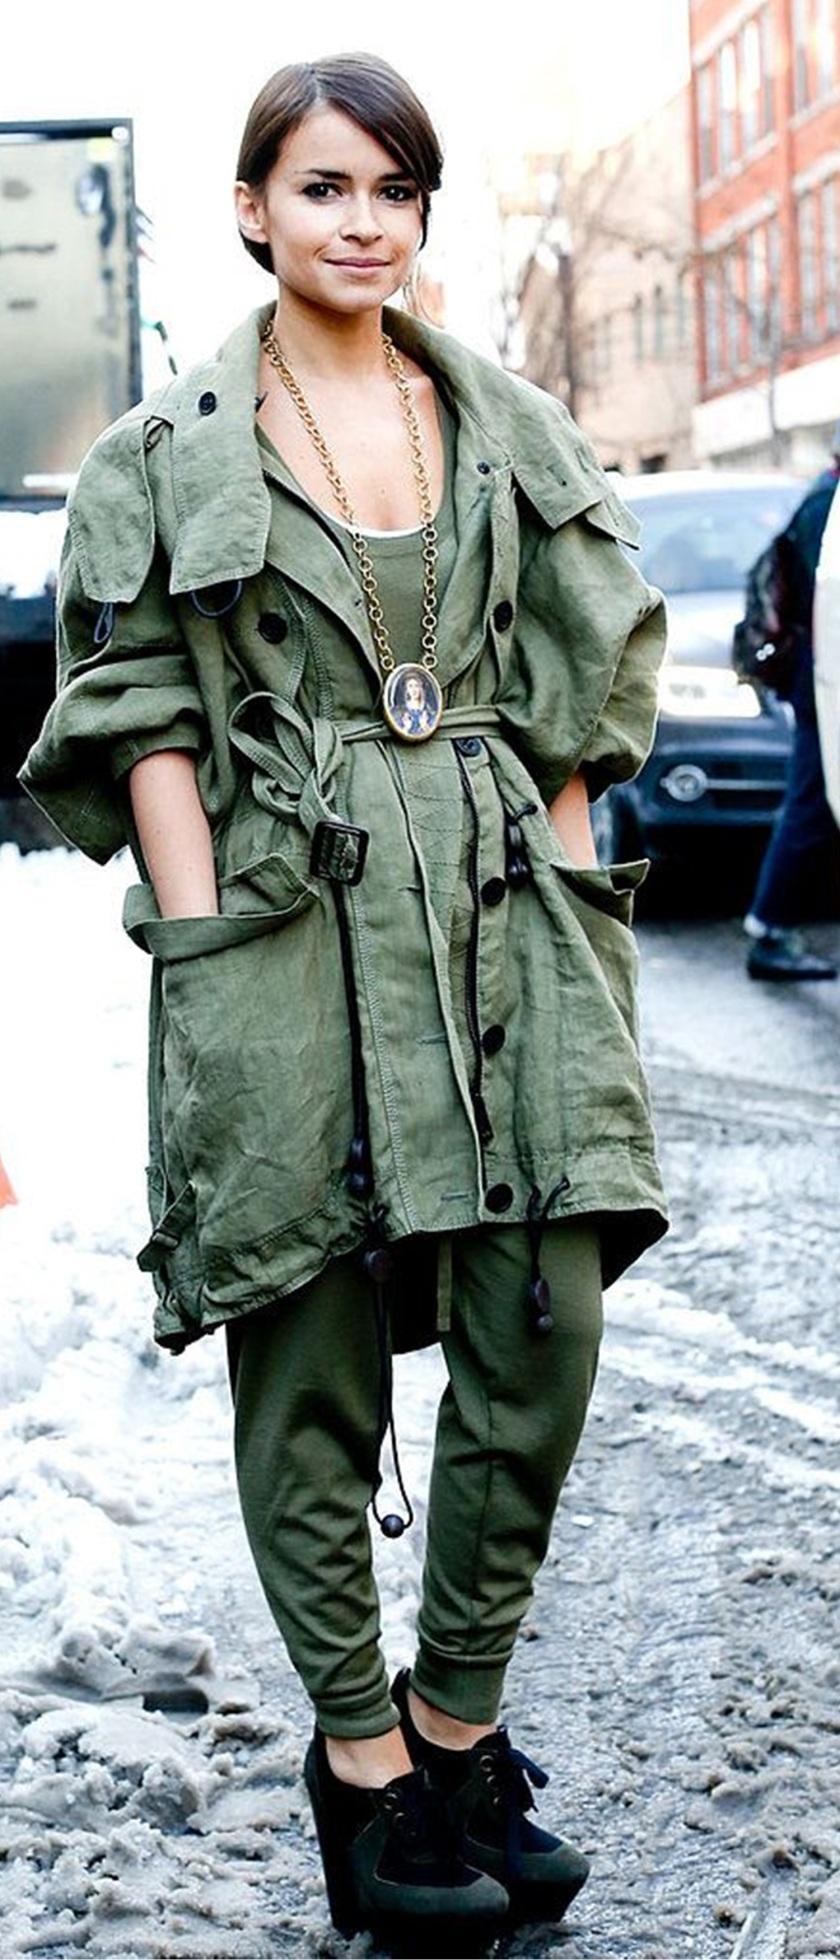 Cuida de ti, cuida tu imagen, tendencias otoño 2014, trendy looks auti¡umn 2014, khaki colour, military style 222